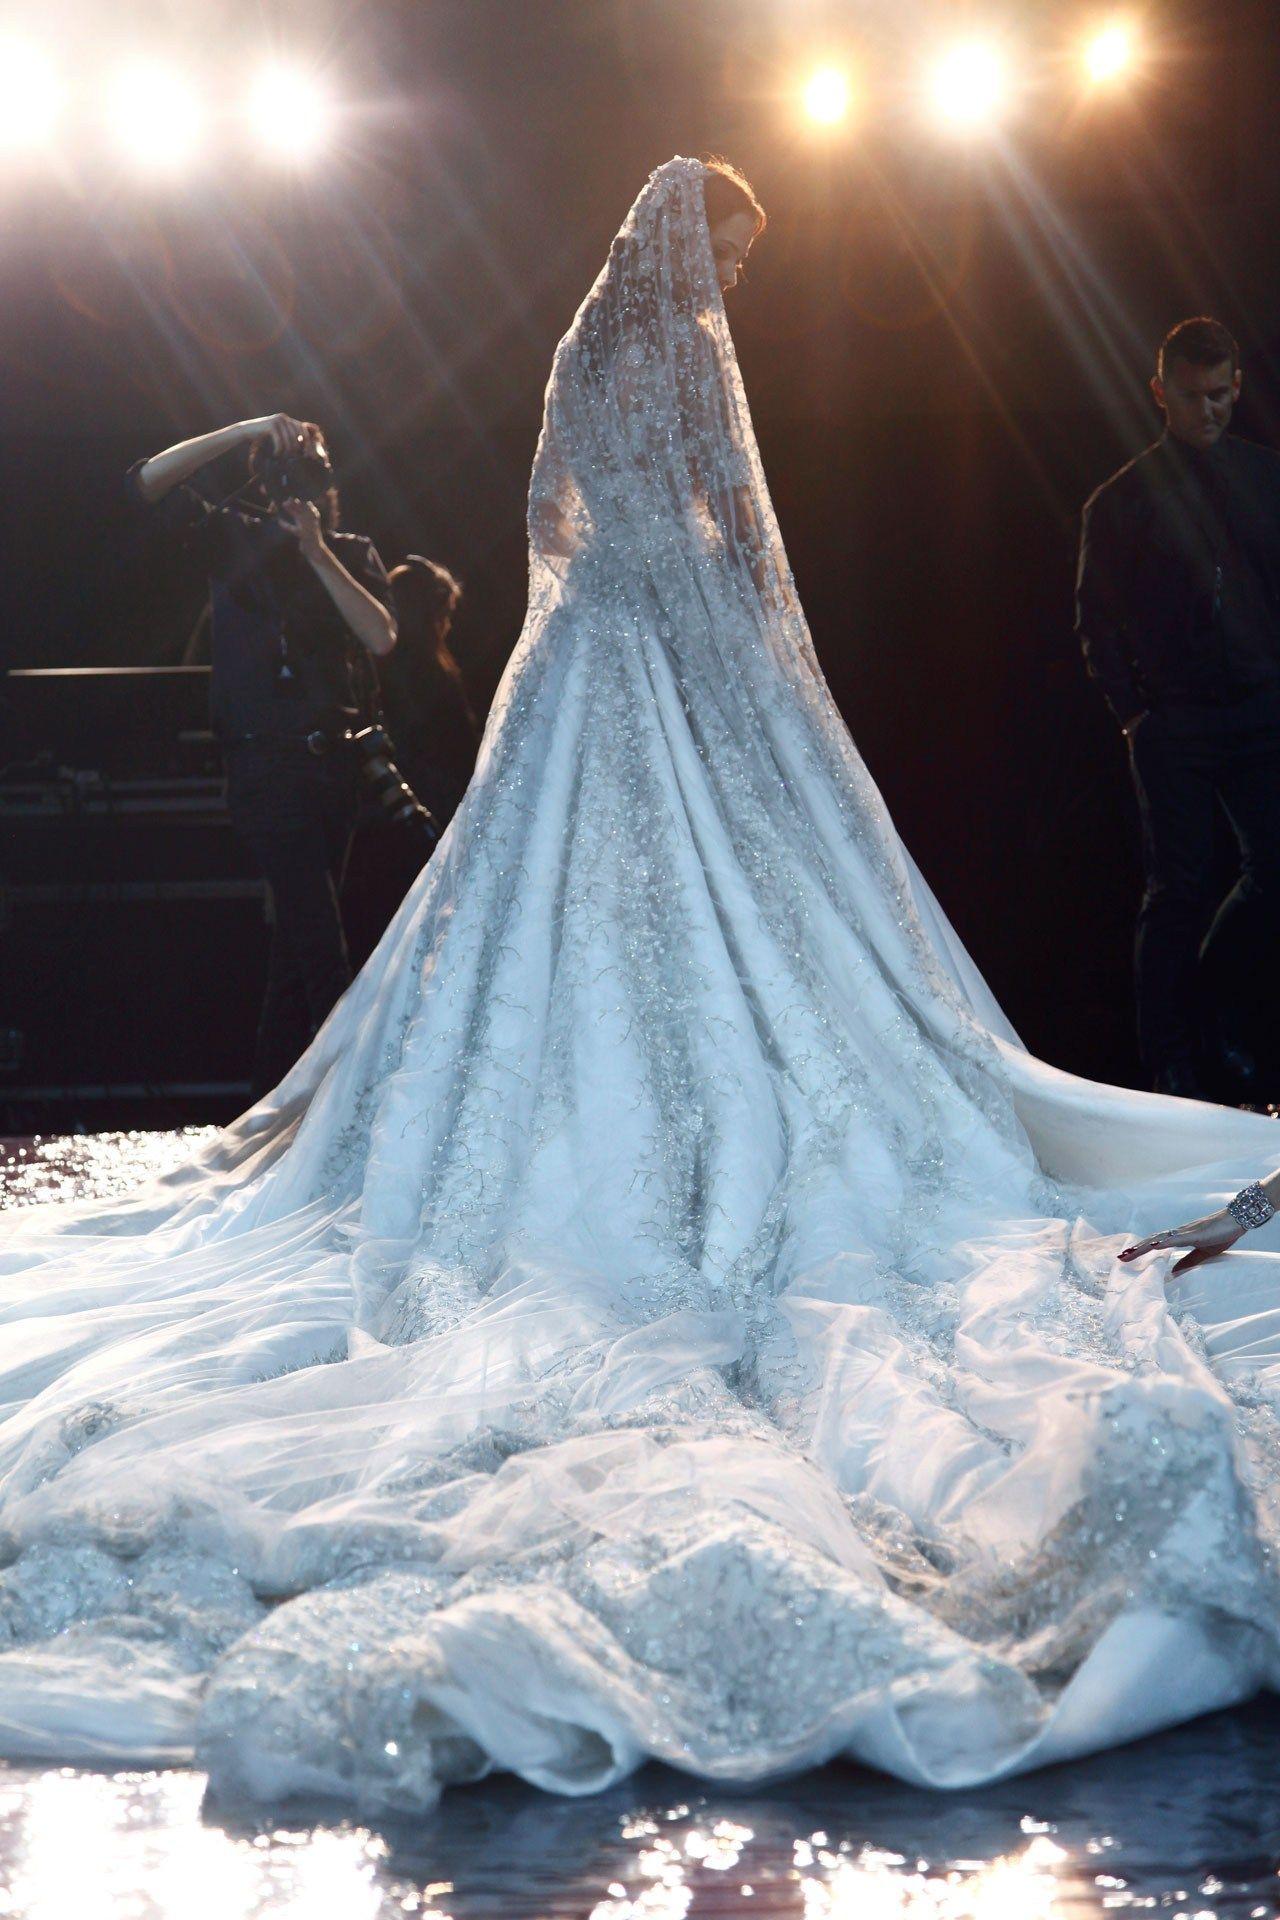 Ralph Russo Couture Bride Pictures Bridal Dresses Frozen Wedding Dress Disney: Frozen Wedding Dress Replica At Websimilar.org